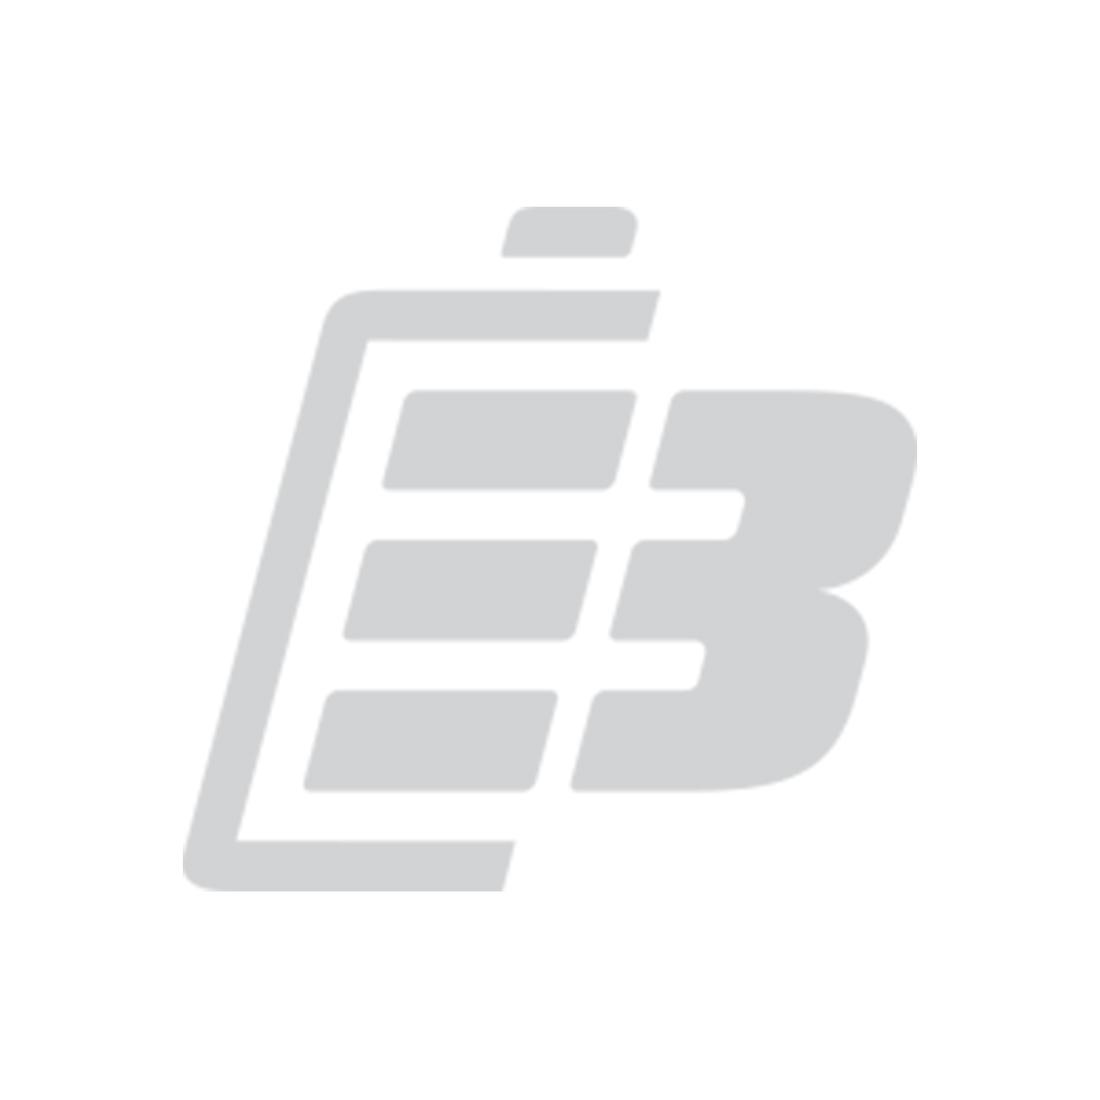 Crane remote control battery Autec Plus MK_1